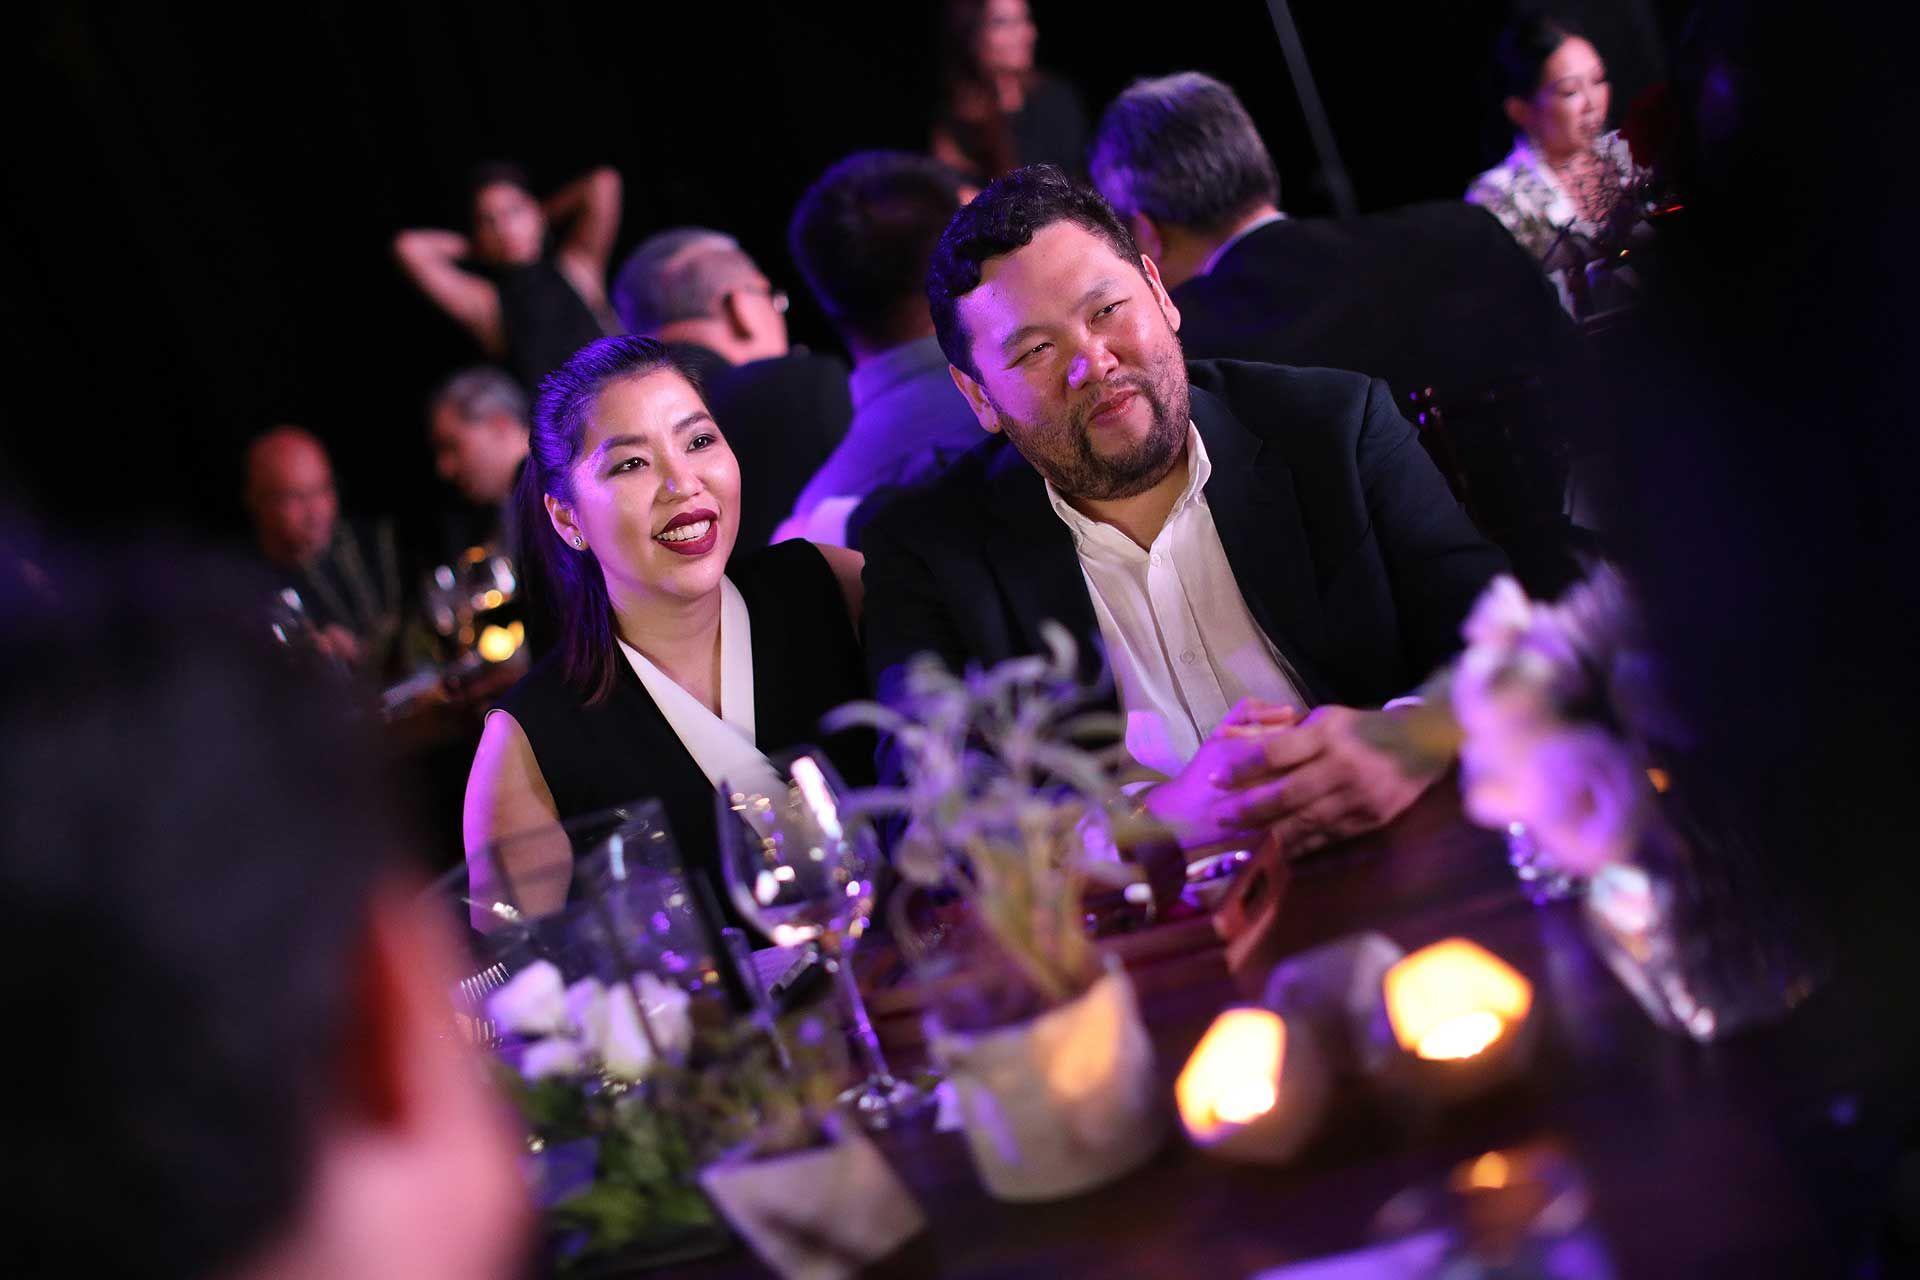 Elizabeth Lee Yong and Benjamin Yong